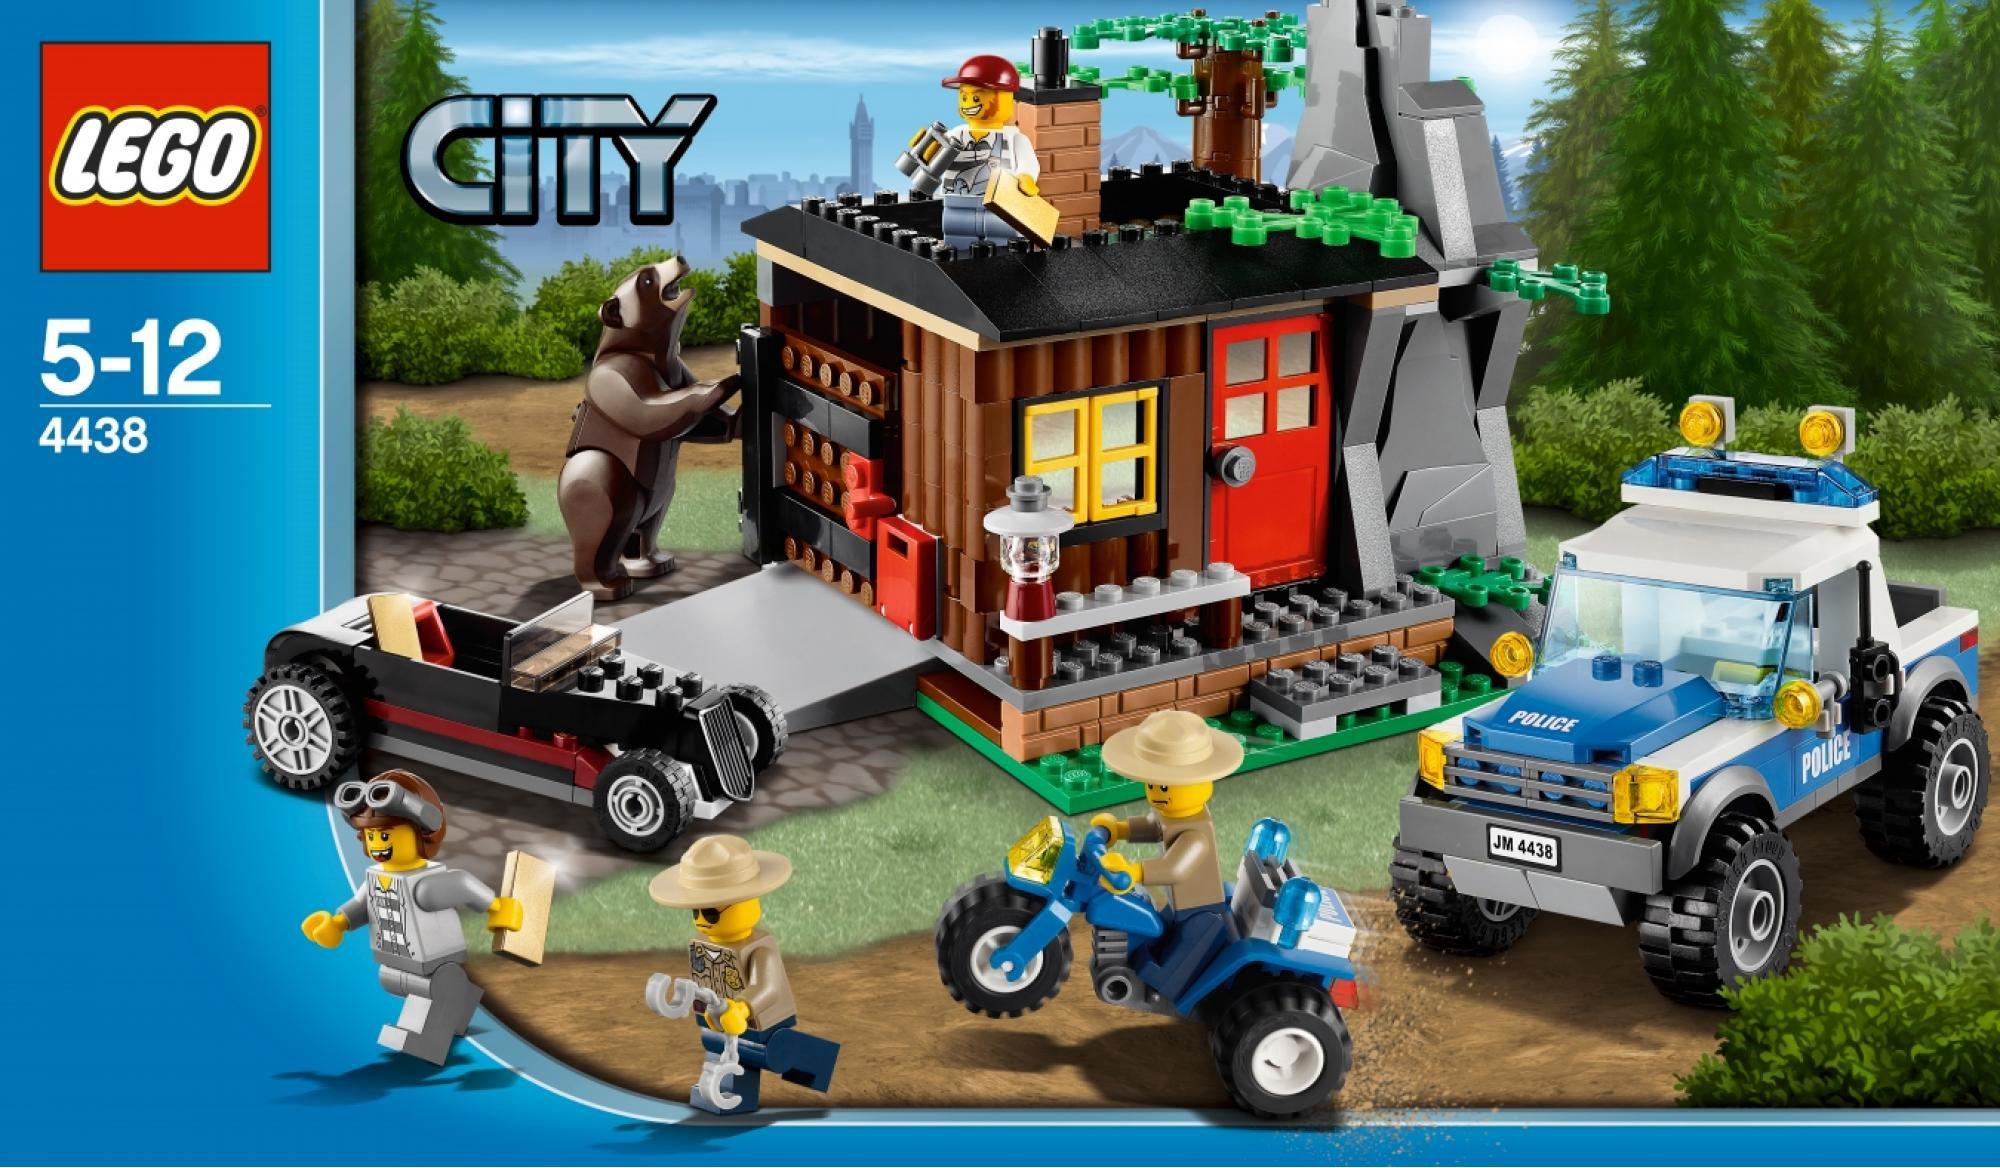 Lego City Lego City 2012 4438 Lego City Sets Lego City New Lego City Sets